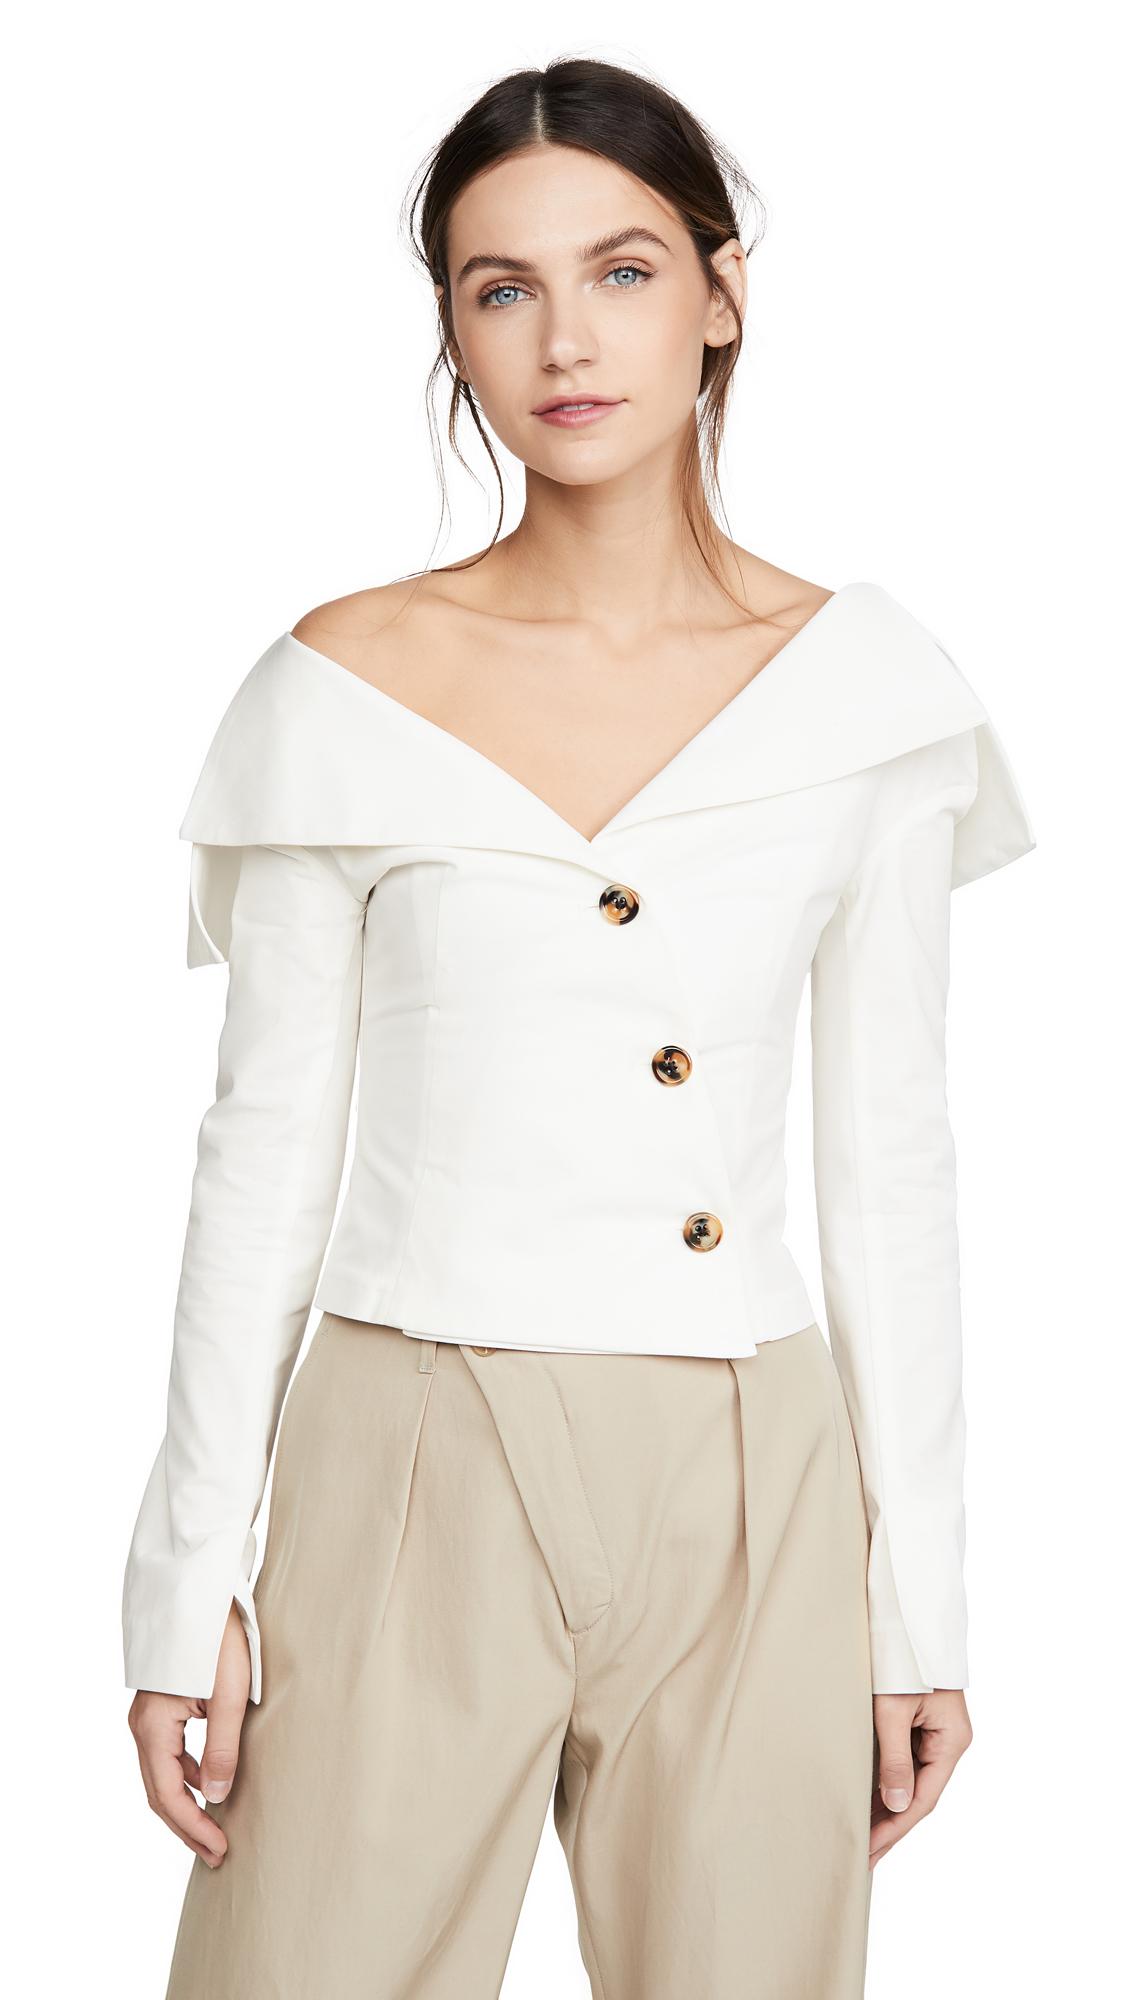 A.W.A.K.E MODE Off Shoulder Jacket Top - 40% Off Sale